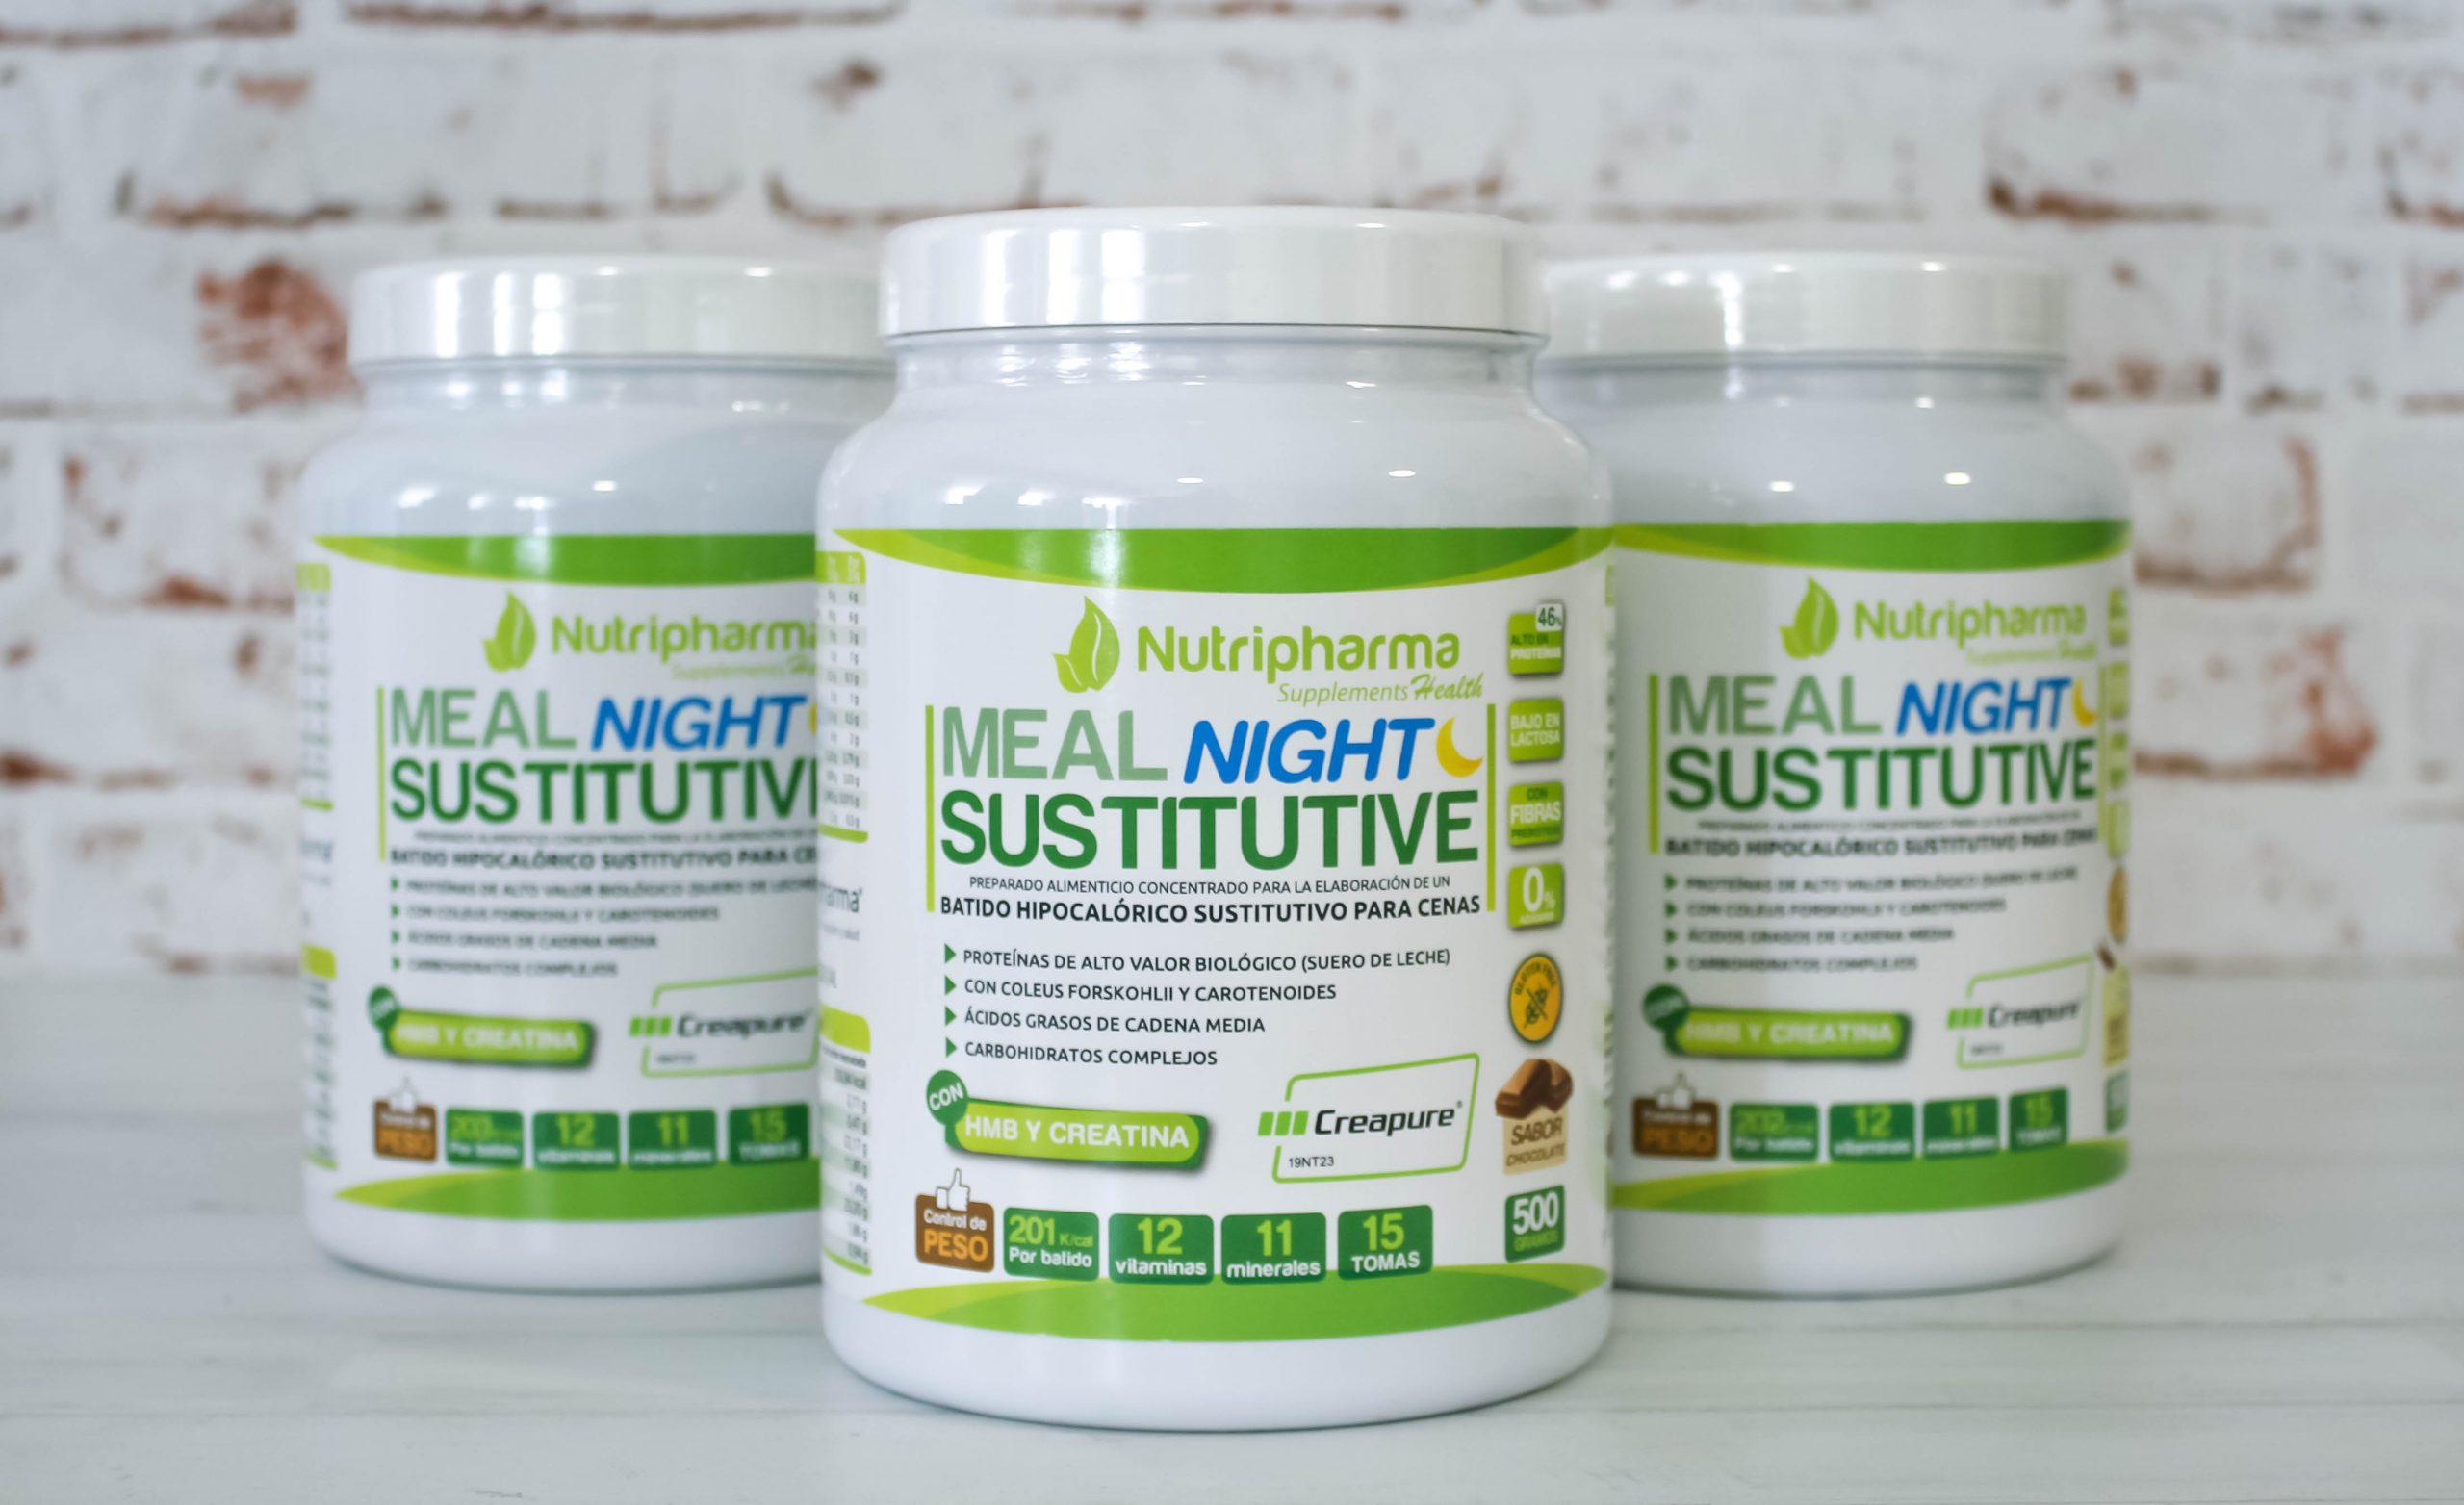 MealNightSustitutive_NutripharmaSuplements (5)